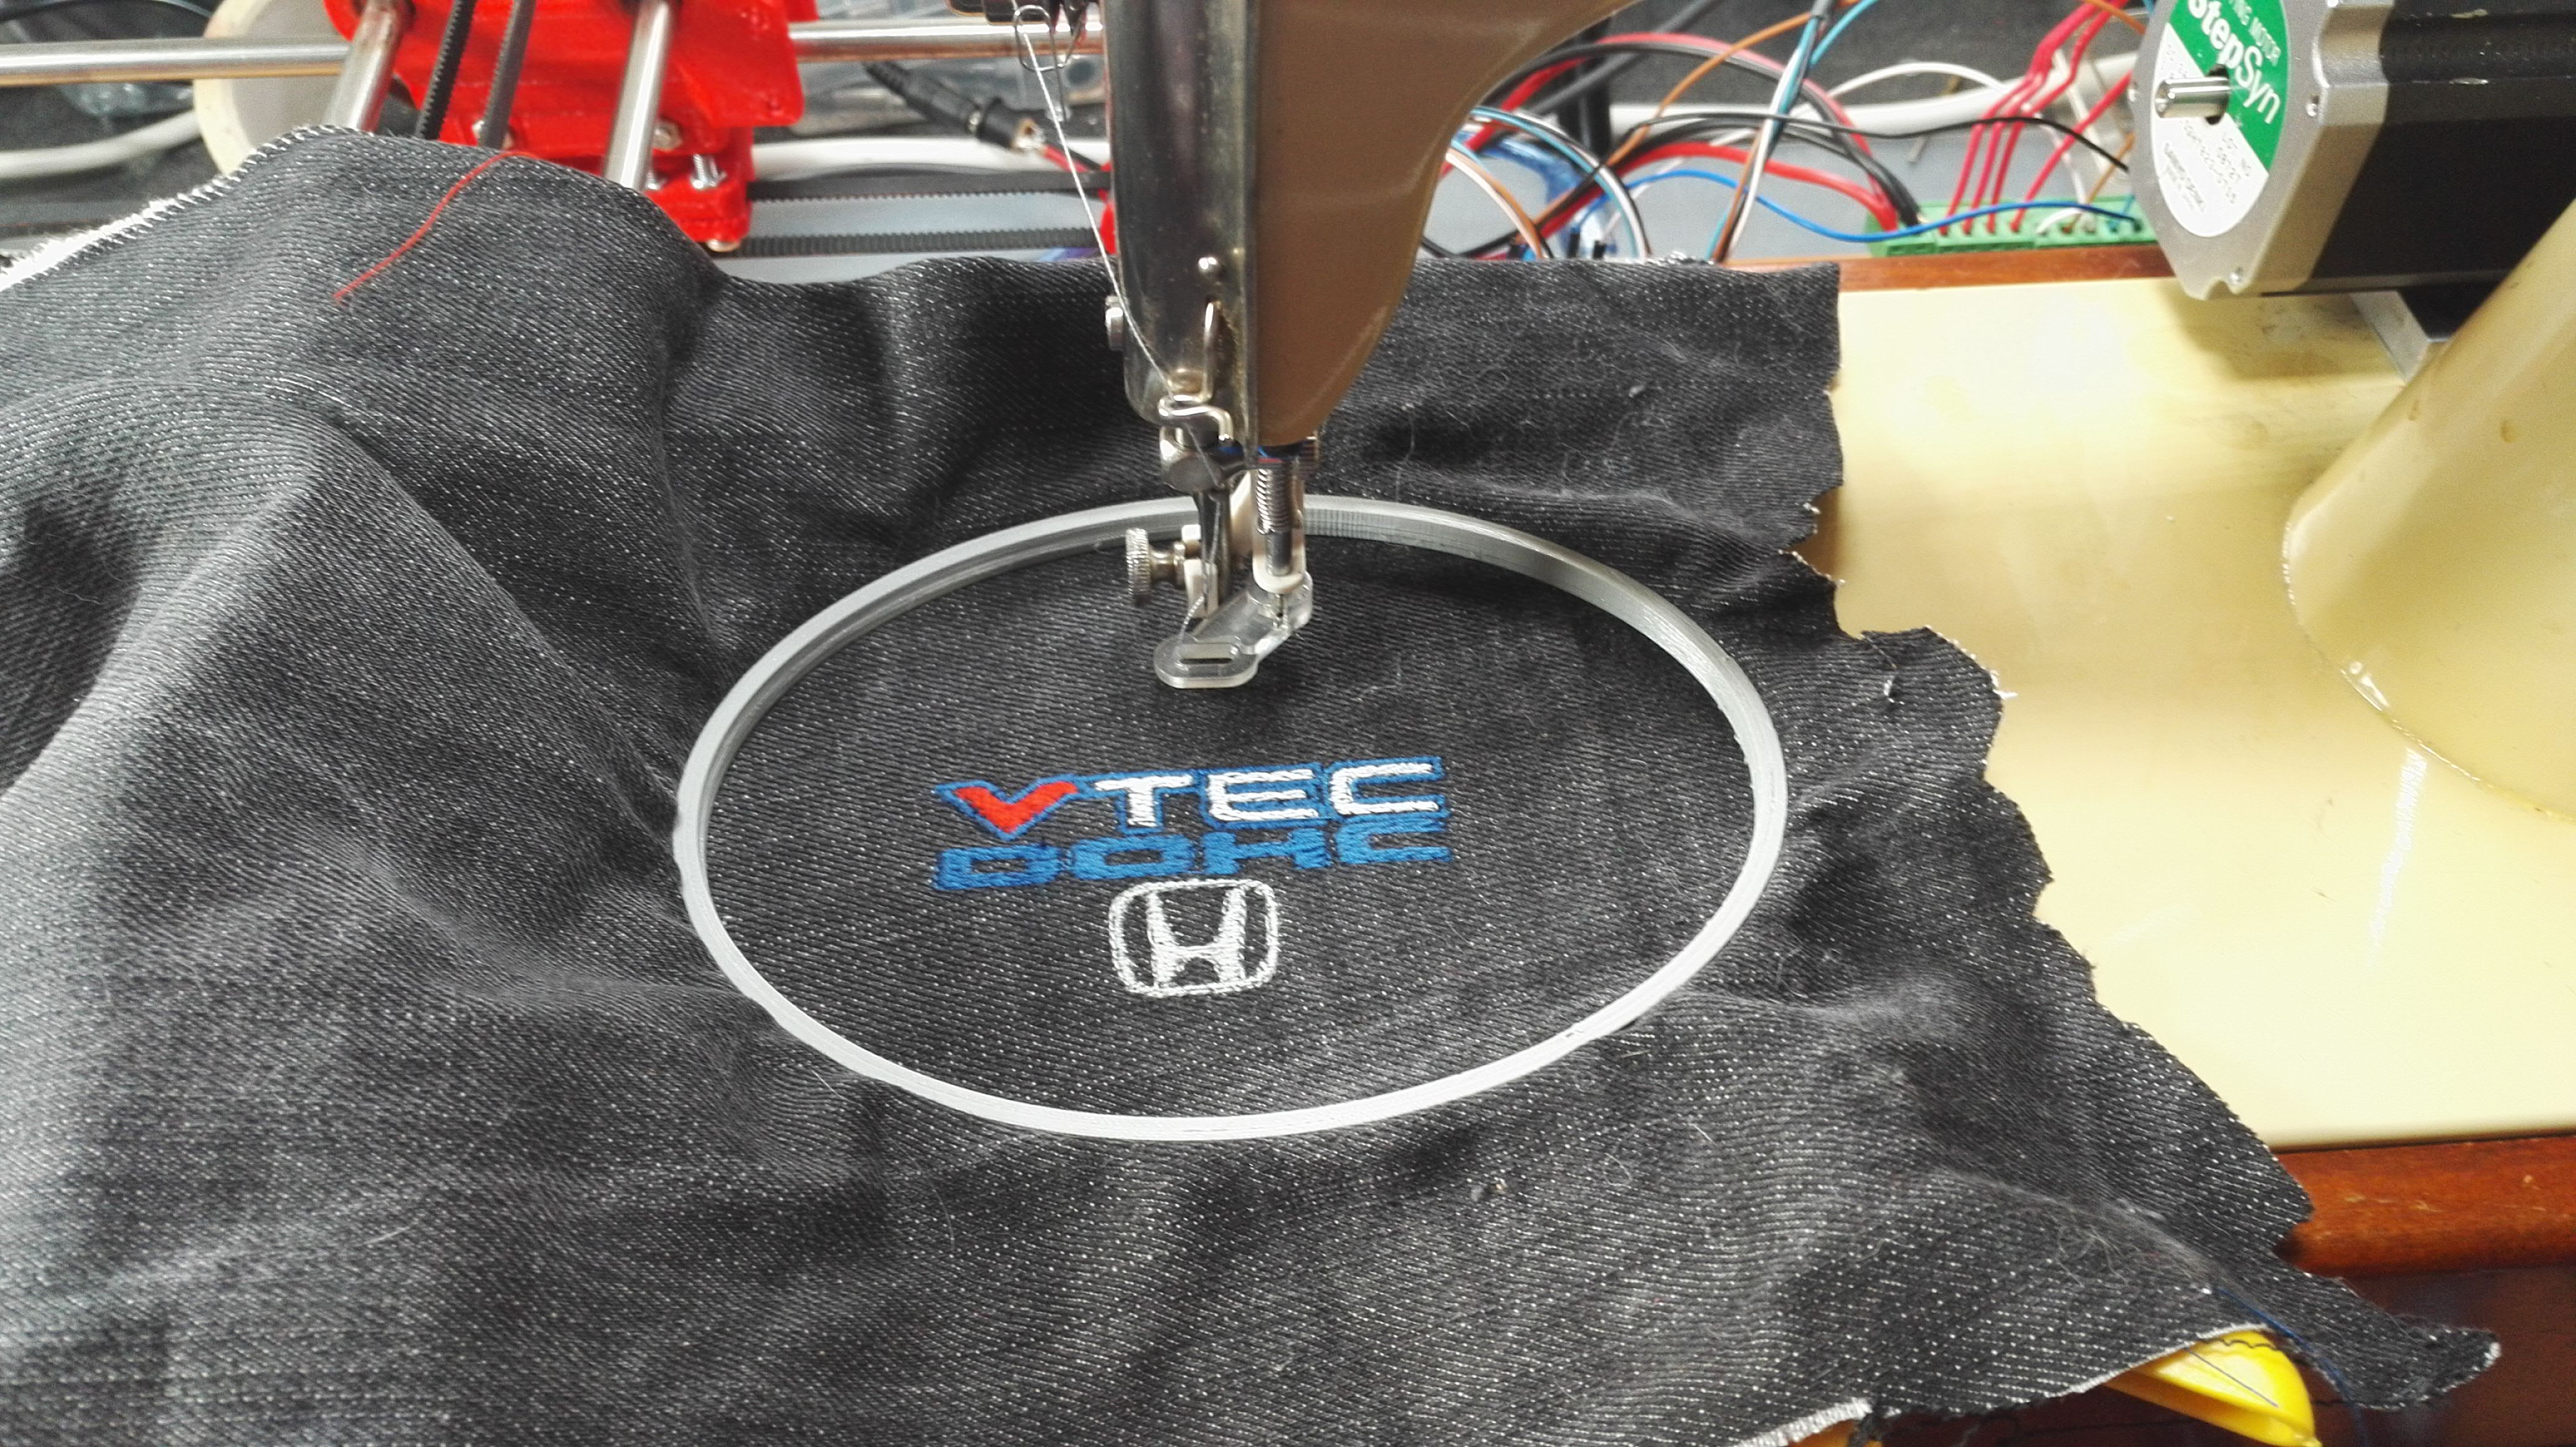 Self-Made Embroidery Machine (Running on G-Code) - Ink/Stitch